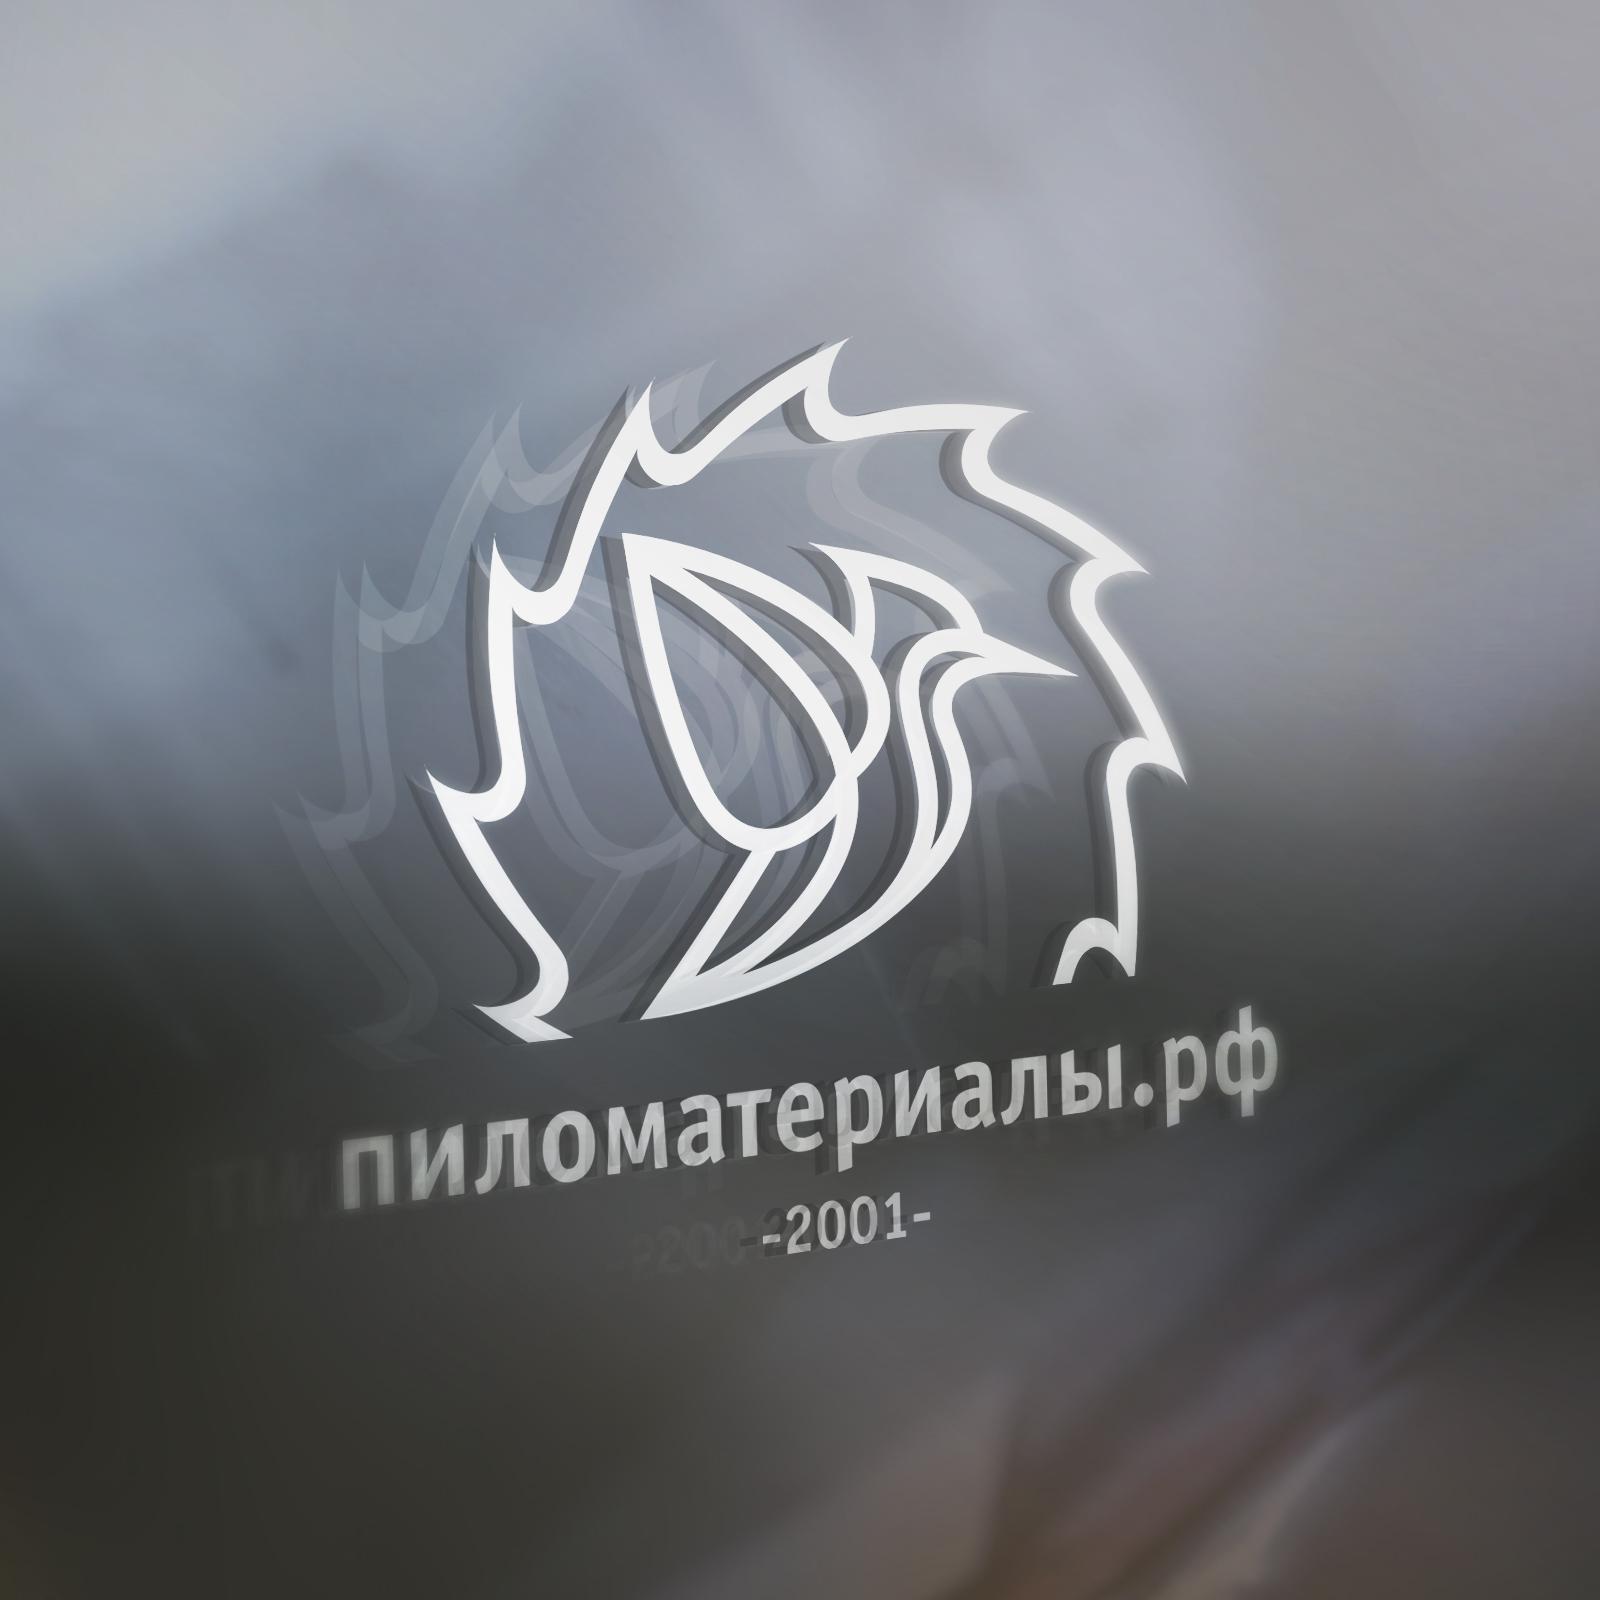 "Создание логотипа и фирменного стиля ""Пиломатериалы.РФ"" фото f_29652fea33a3e517.jpg"